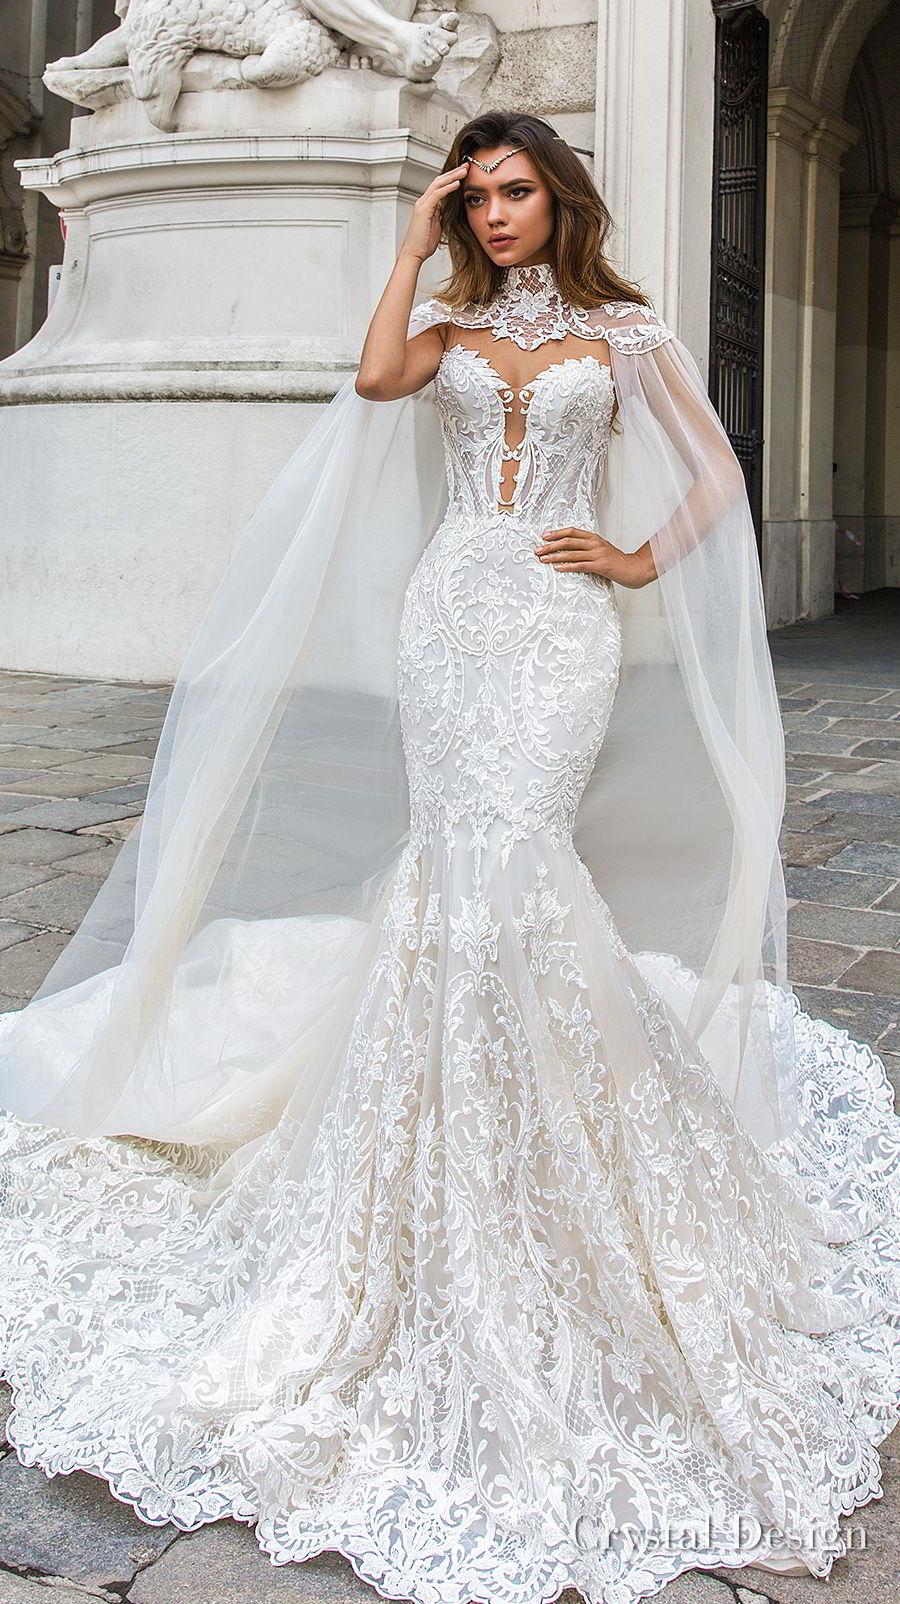 crystal design 2018 sleeveless strapless deep plunging sweetheart neckline full embellishment elegant mermaid wedding dress sheer button back chapel train (gia) mv